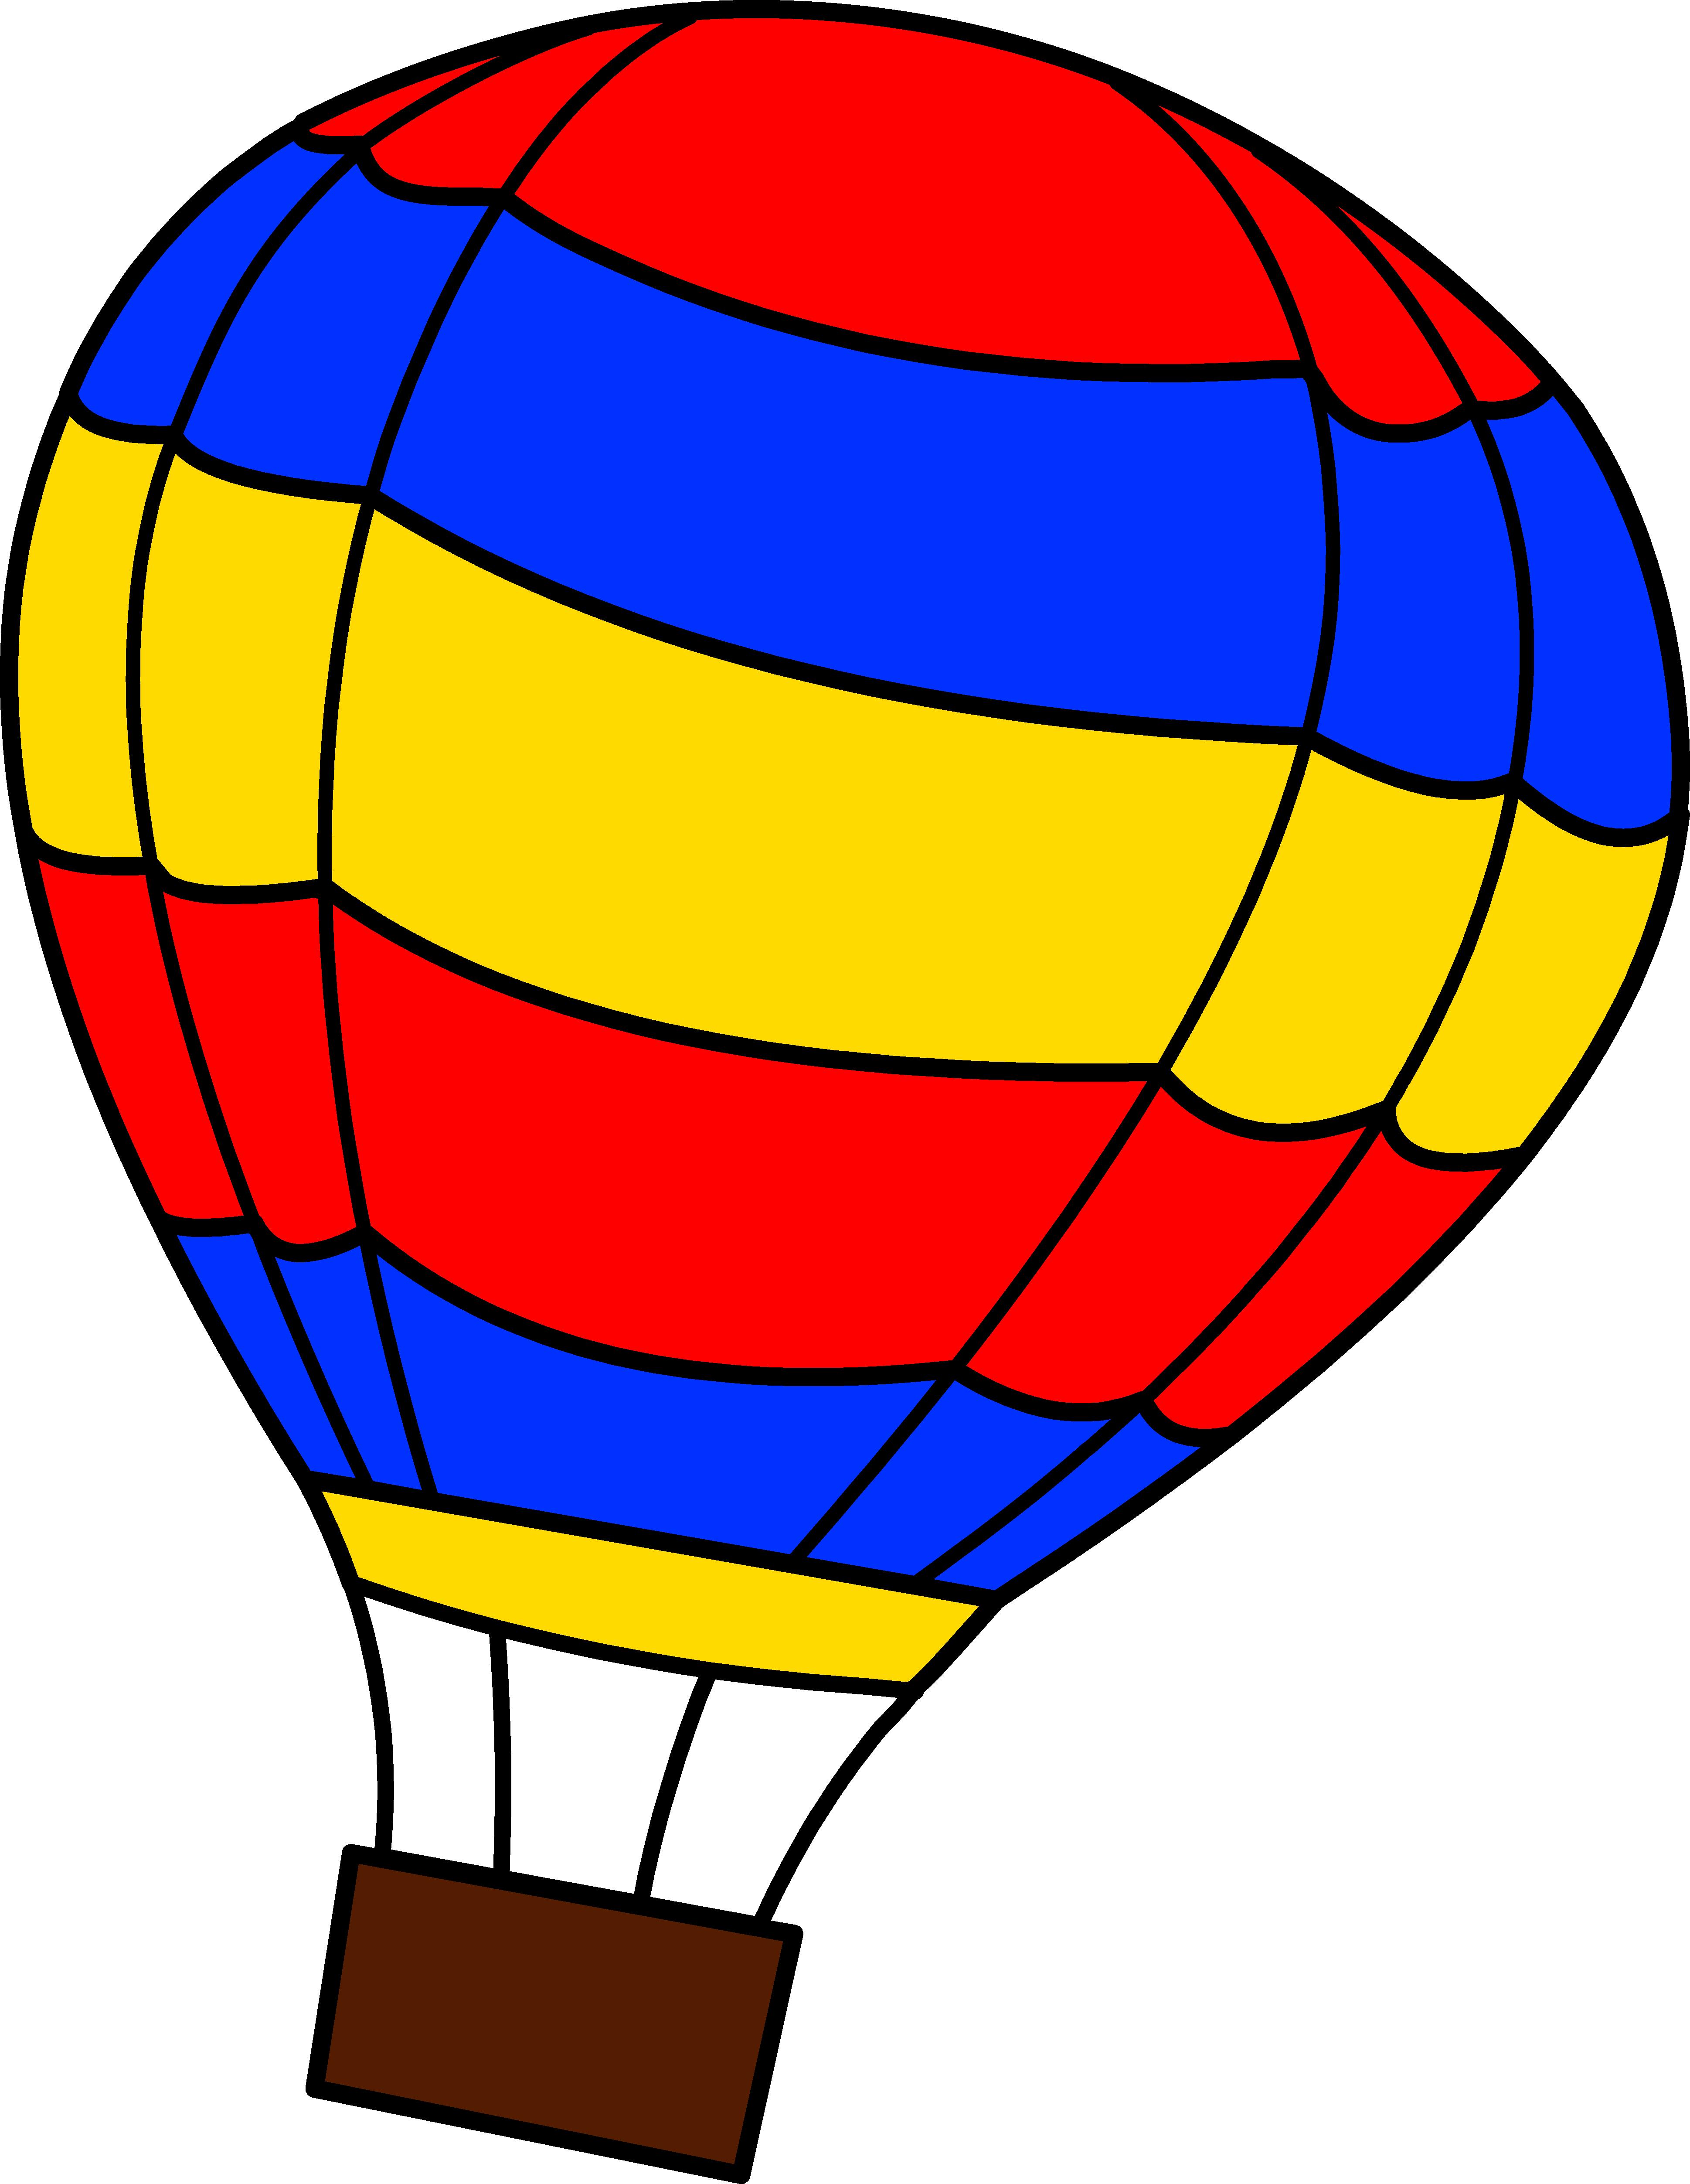 Hot Air Balloon clipart #7, Download drawings